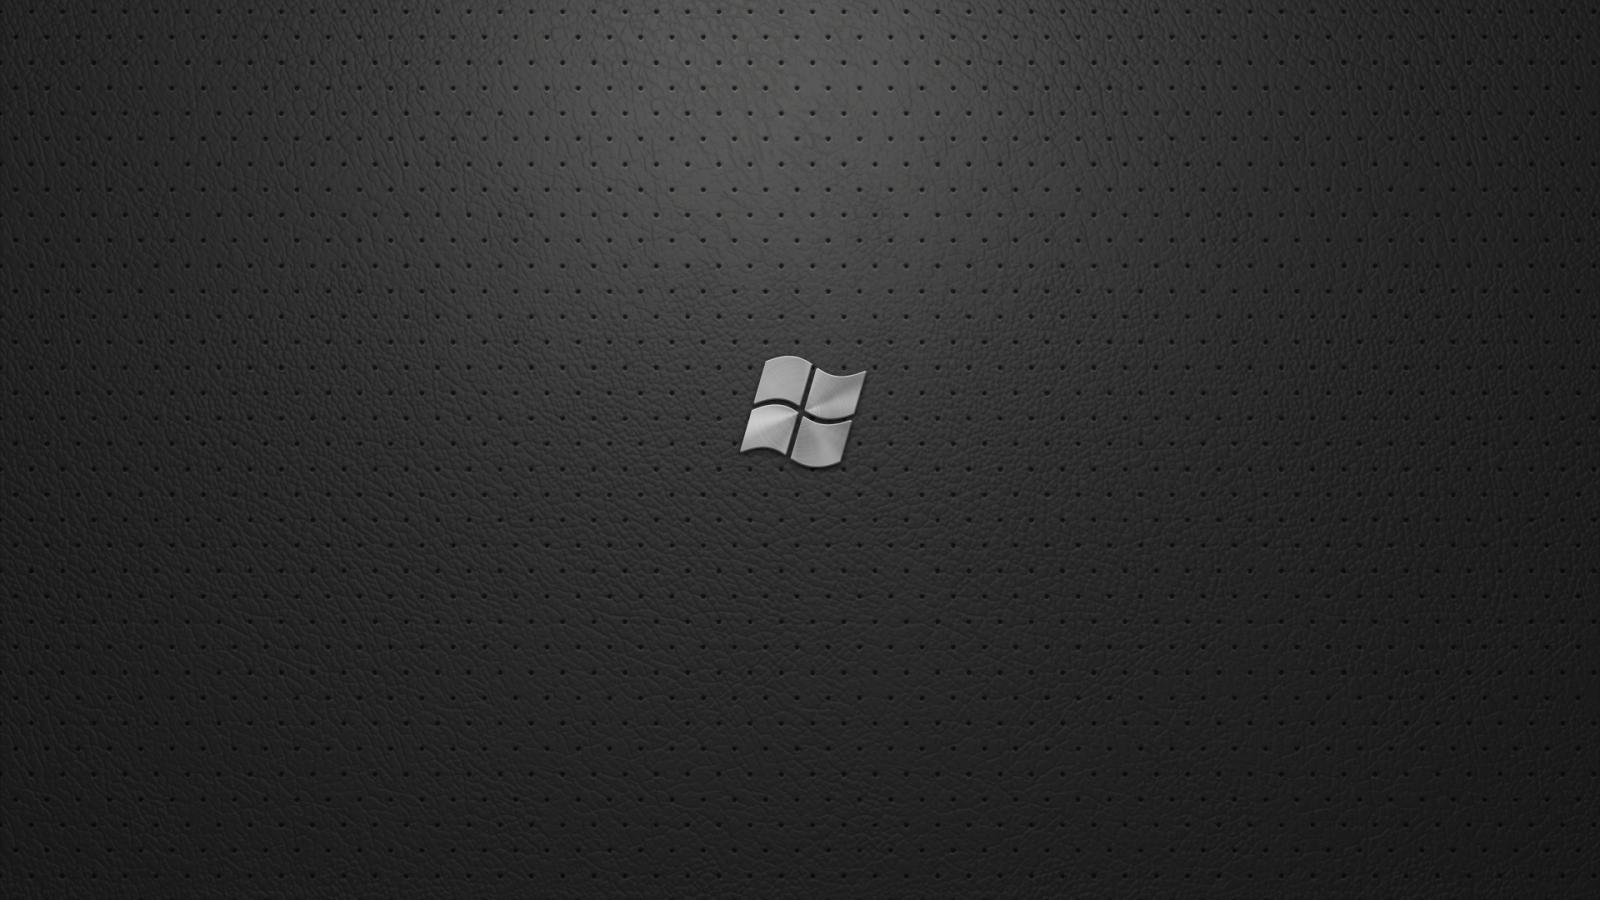 Free Download Descargar Fondos De Pantalla Windows Seven